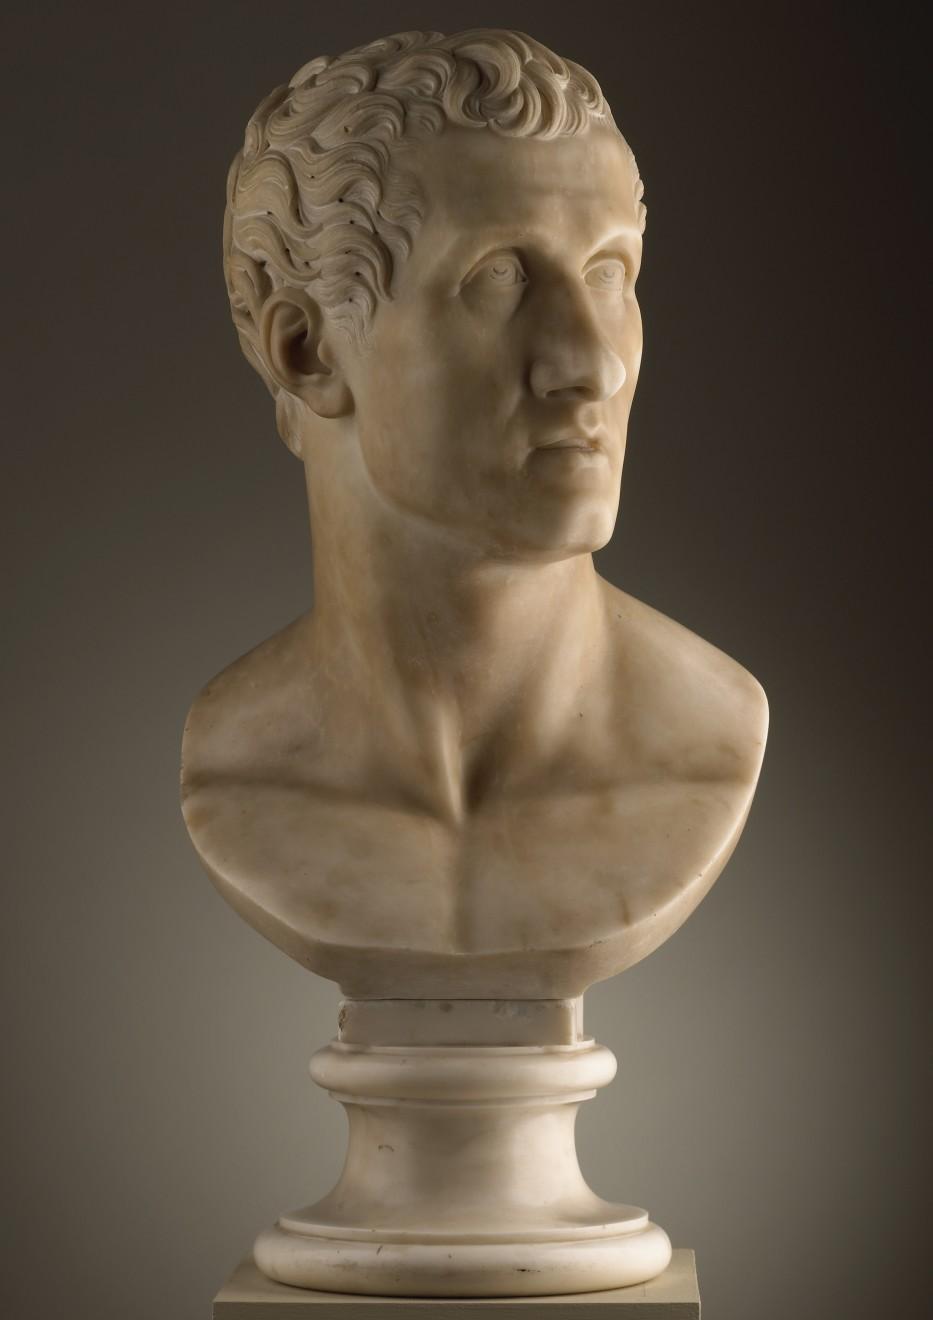 "<p><b>Raimondo Trentanove,</b><i style=""line-height: 1.8em;"">Antonio Canova</i><span style=""line-height: 1.8em;"">, 1817</span></p>"